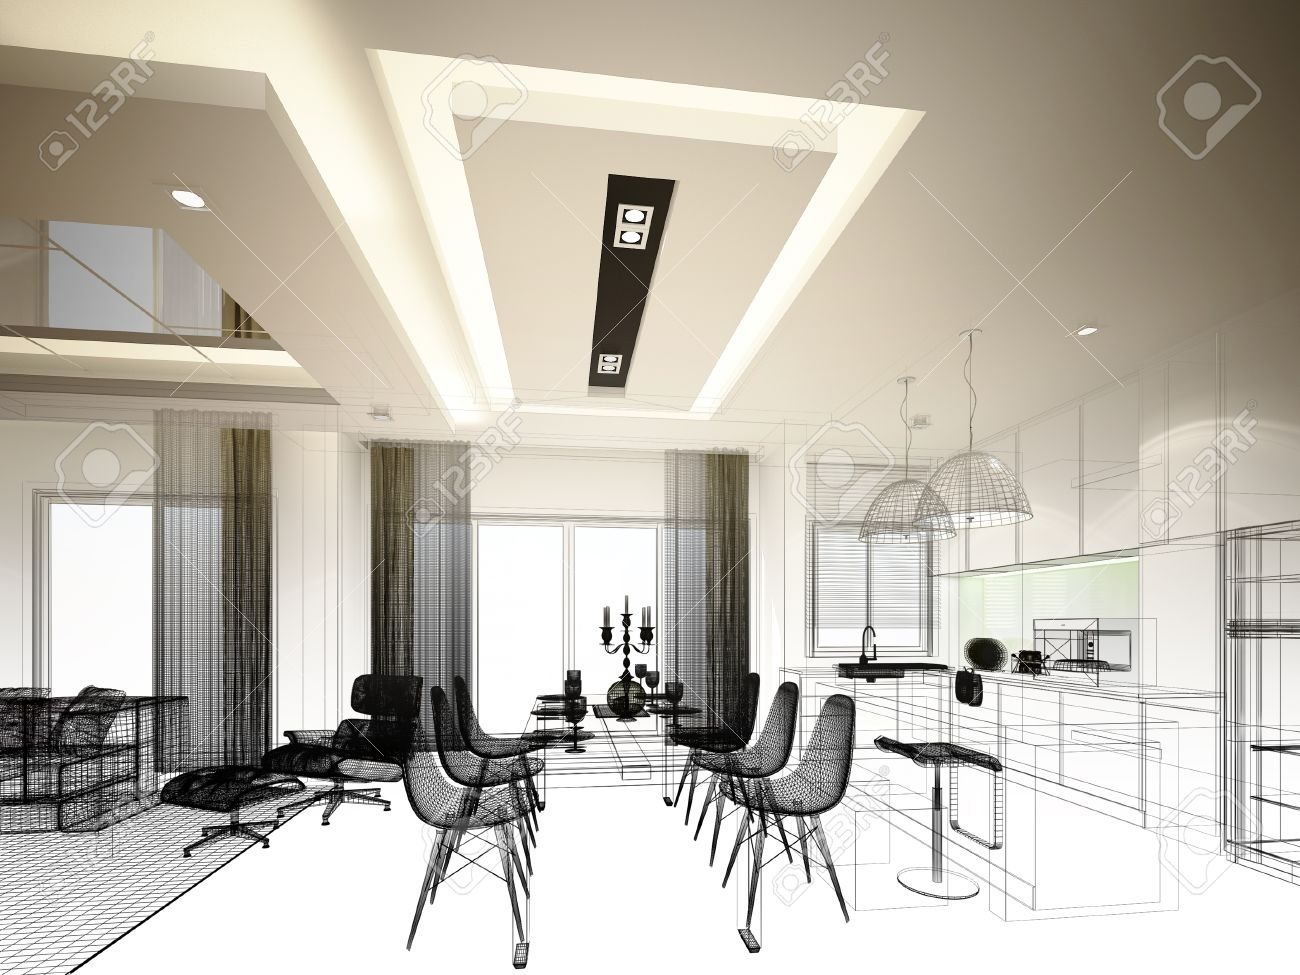 Cucina 3d | Progettare Cucina 3d Gratis Programma Per Progettare ...